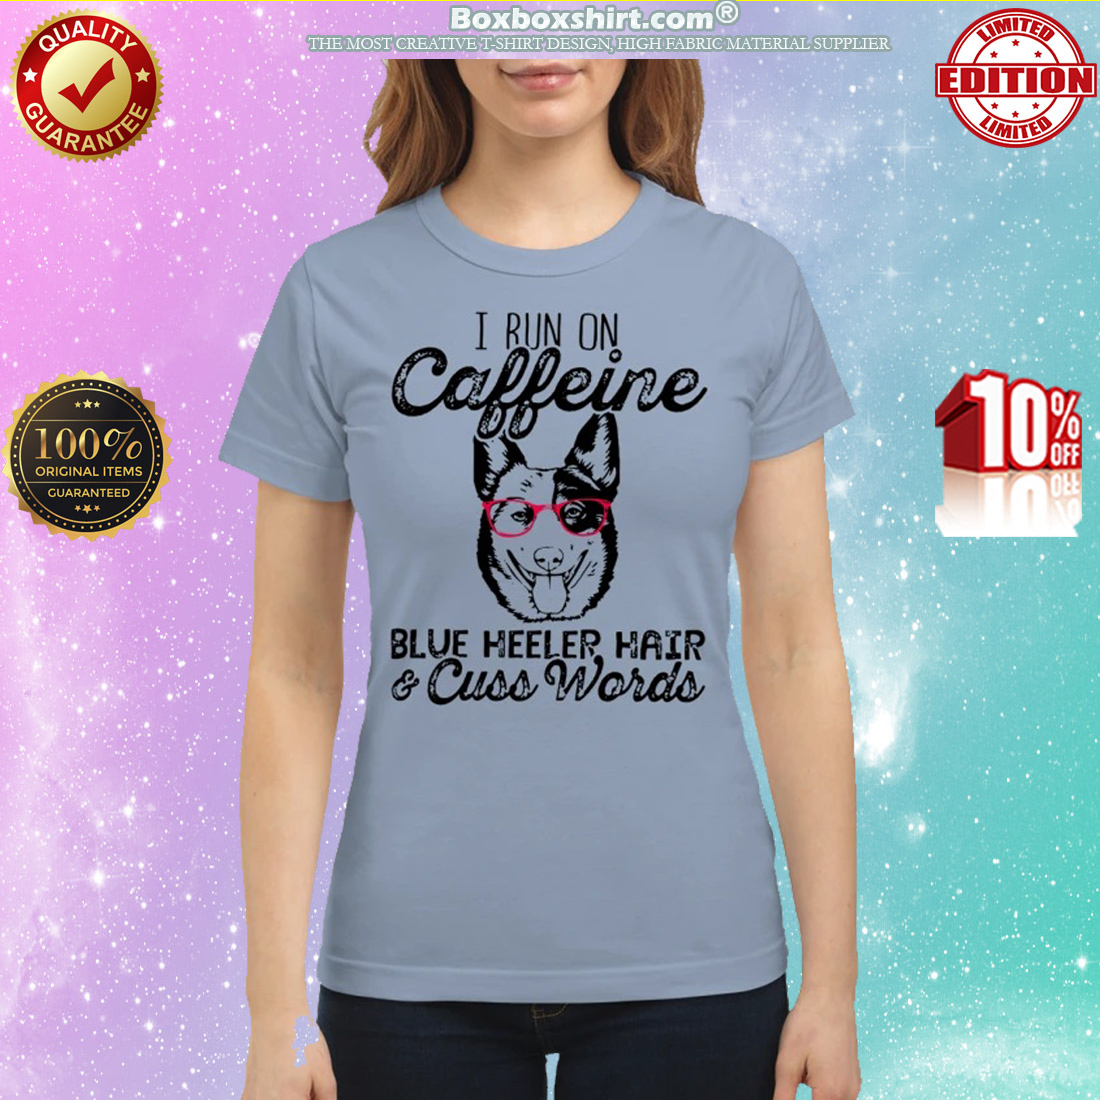 I run on caffeine blue heeler hair and cuss words classic shirt